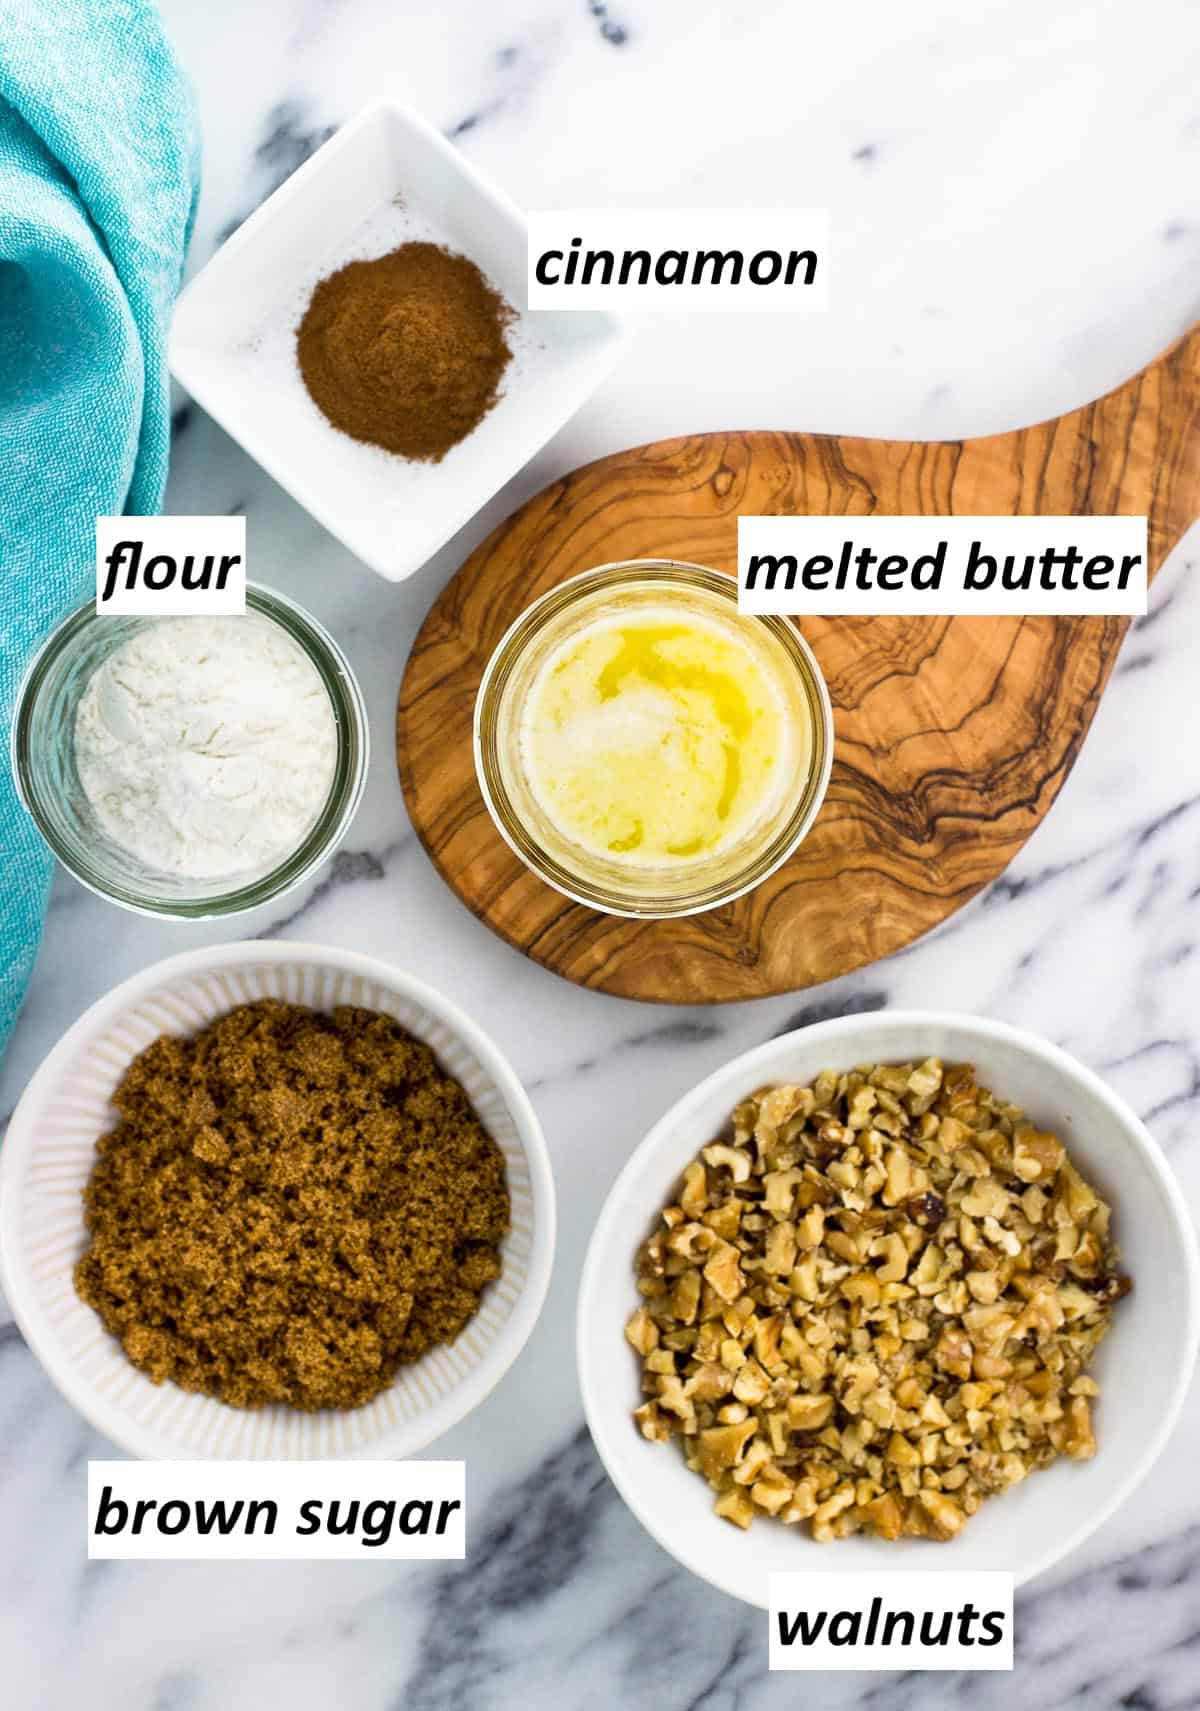 Labeled streusel ingredients in separate bowls.